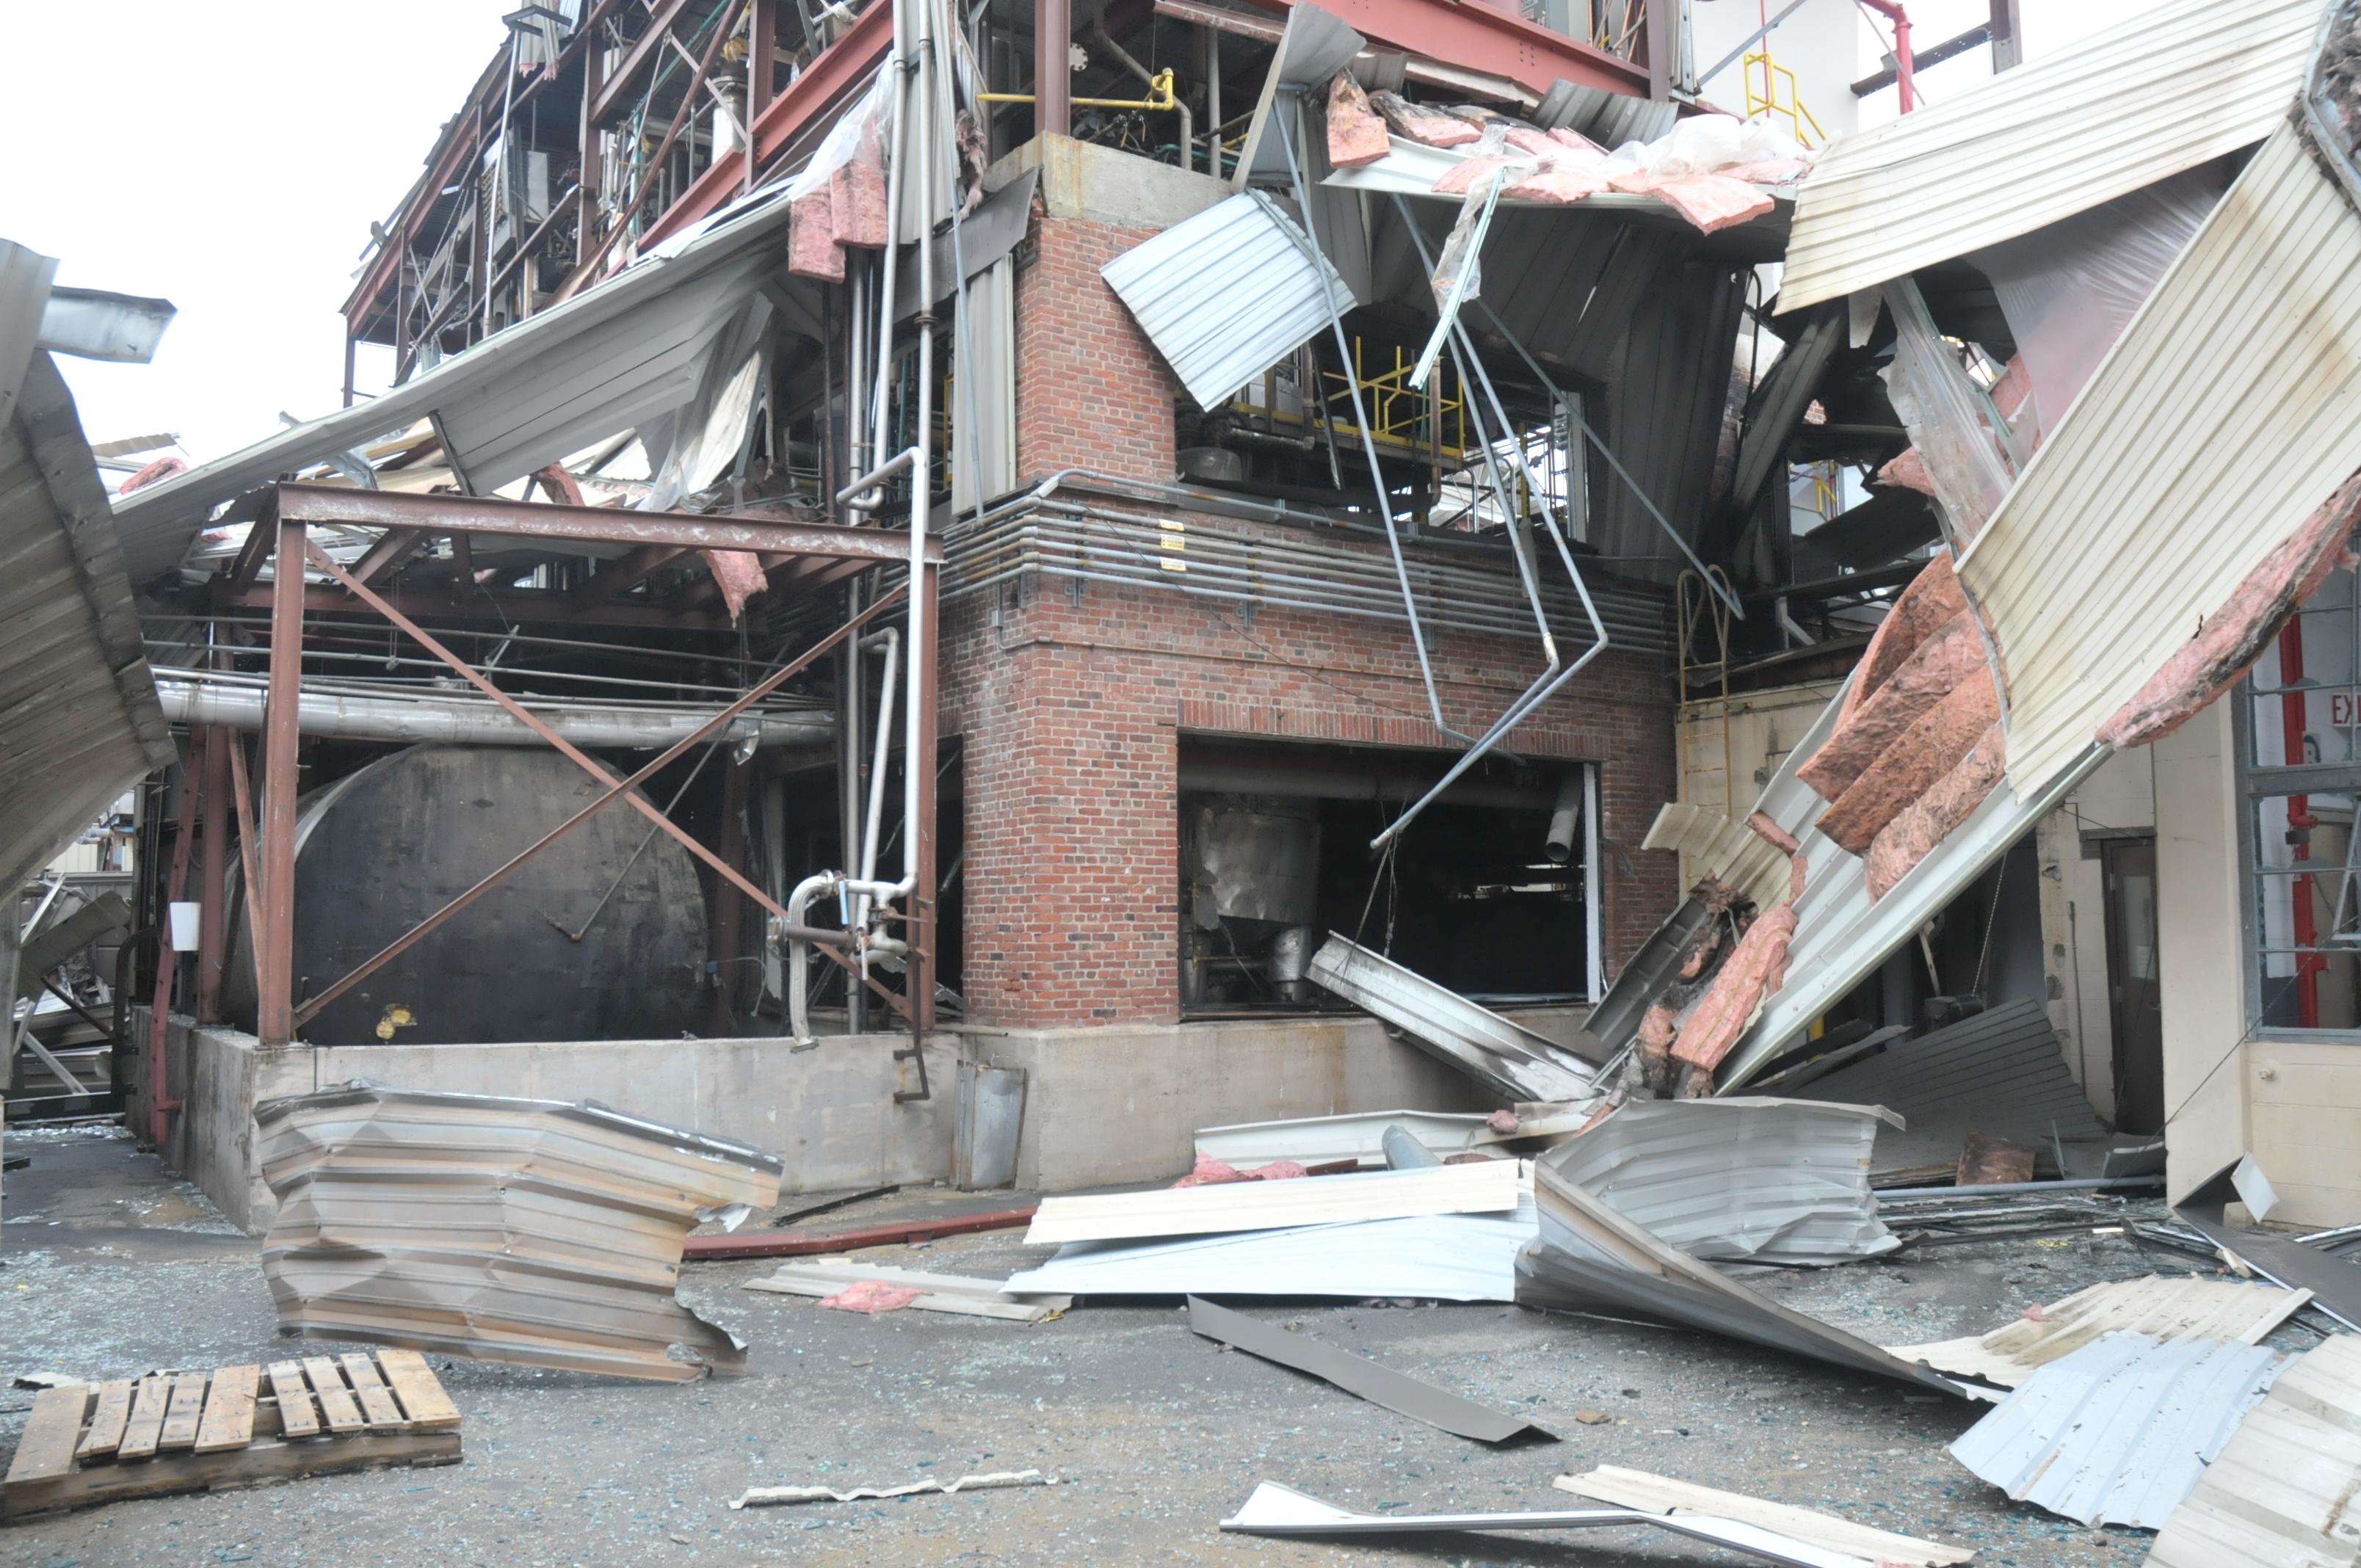 VERTEX, Fire Investigation, Explosion Claim